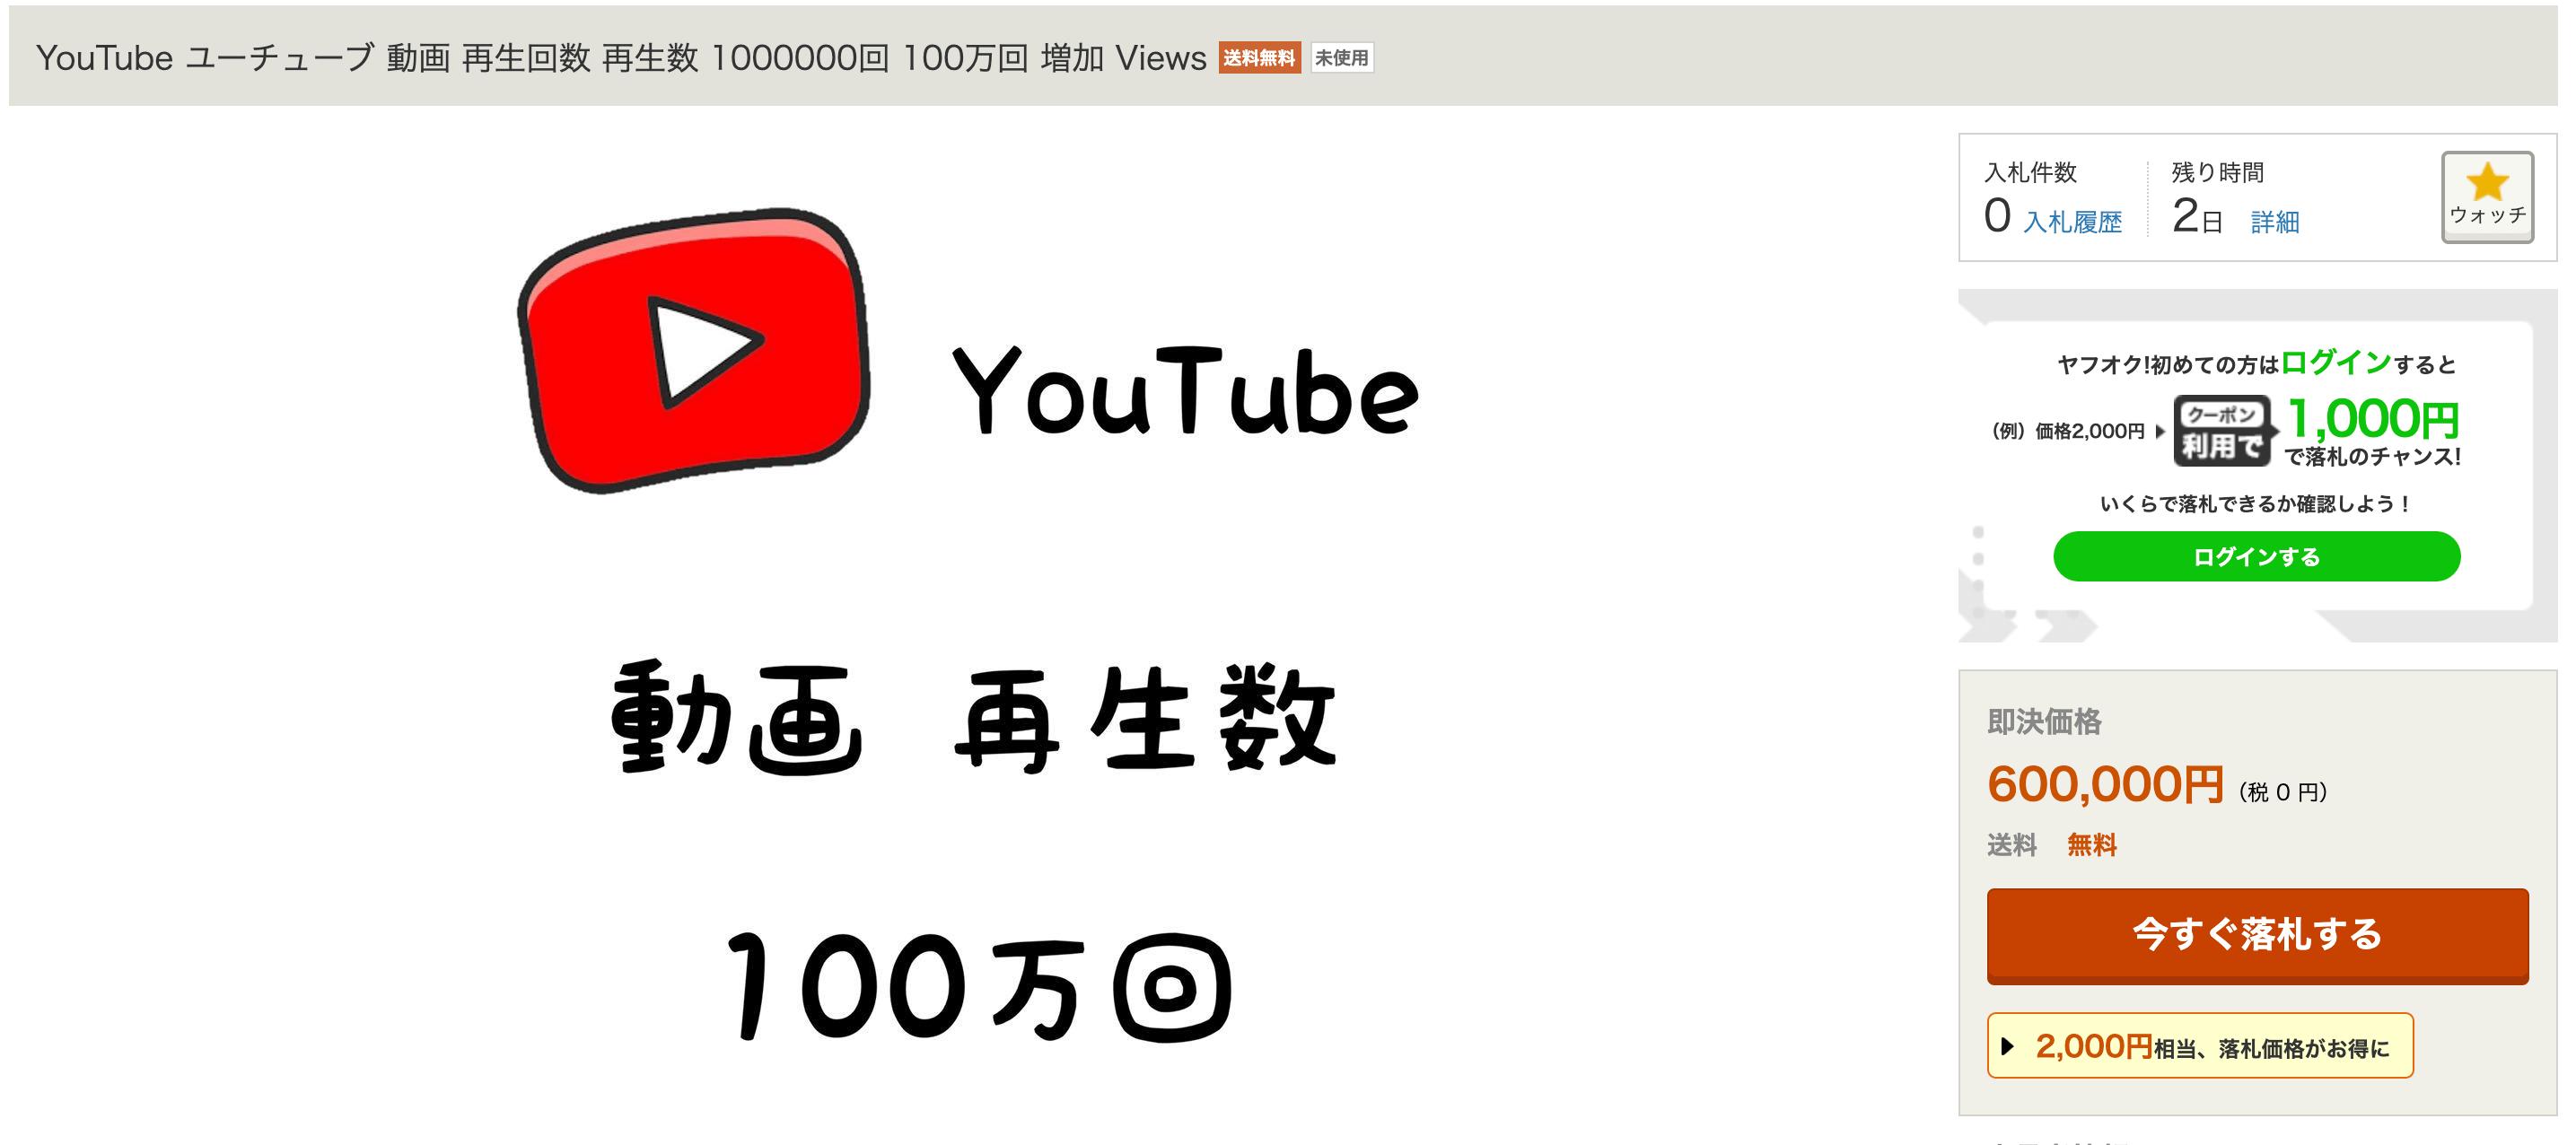 youtube-million views-purchase